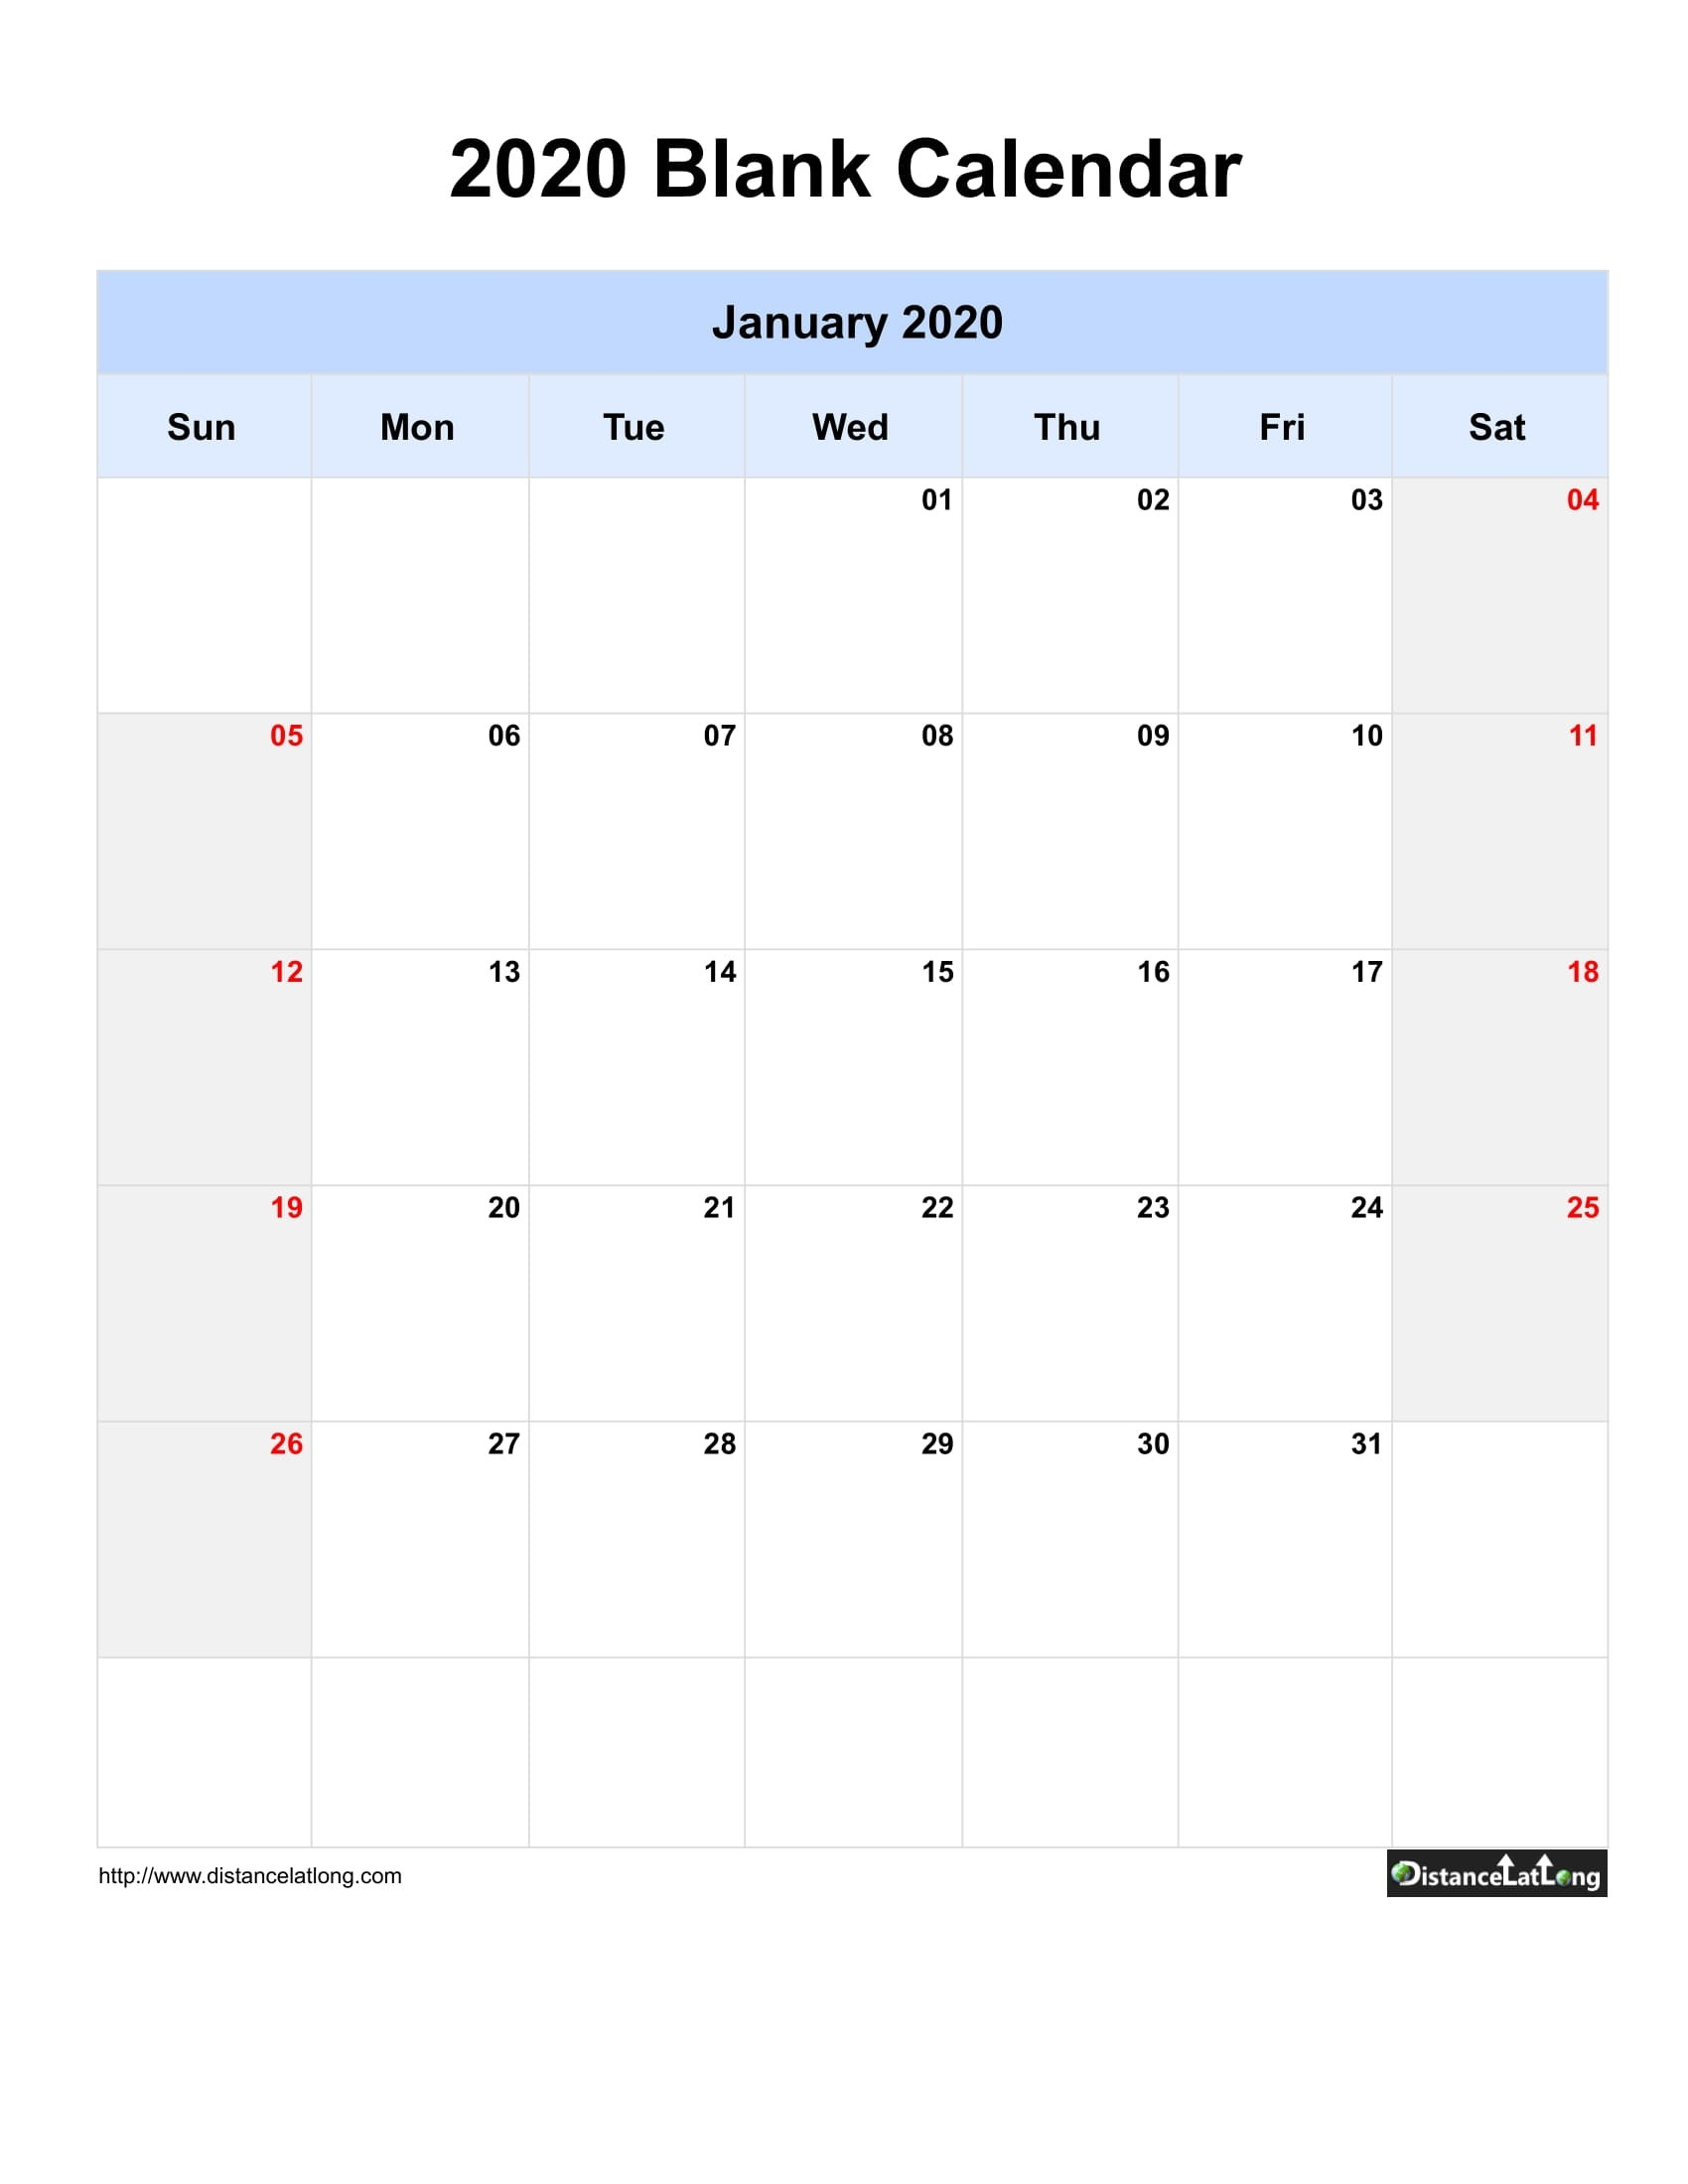 2020 Blank Calendar Blank Portrait Orientation Free-Day To Day Calendar Template 2020